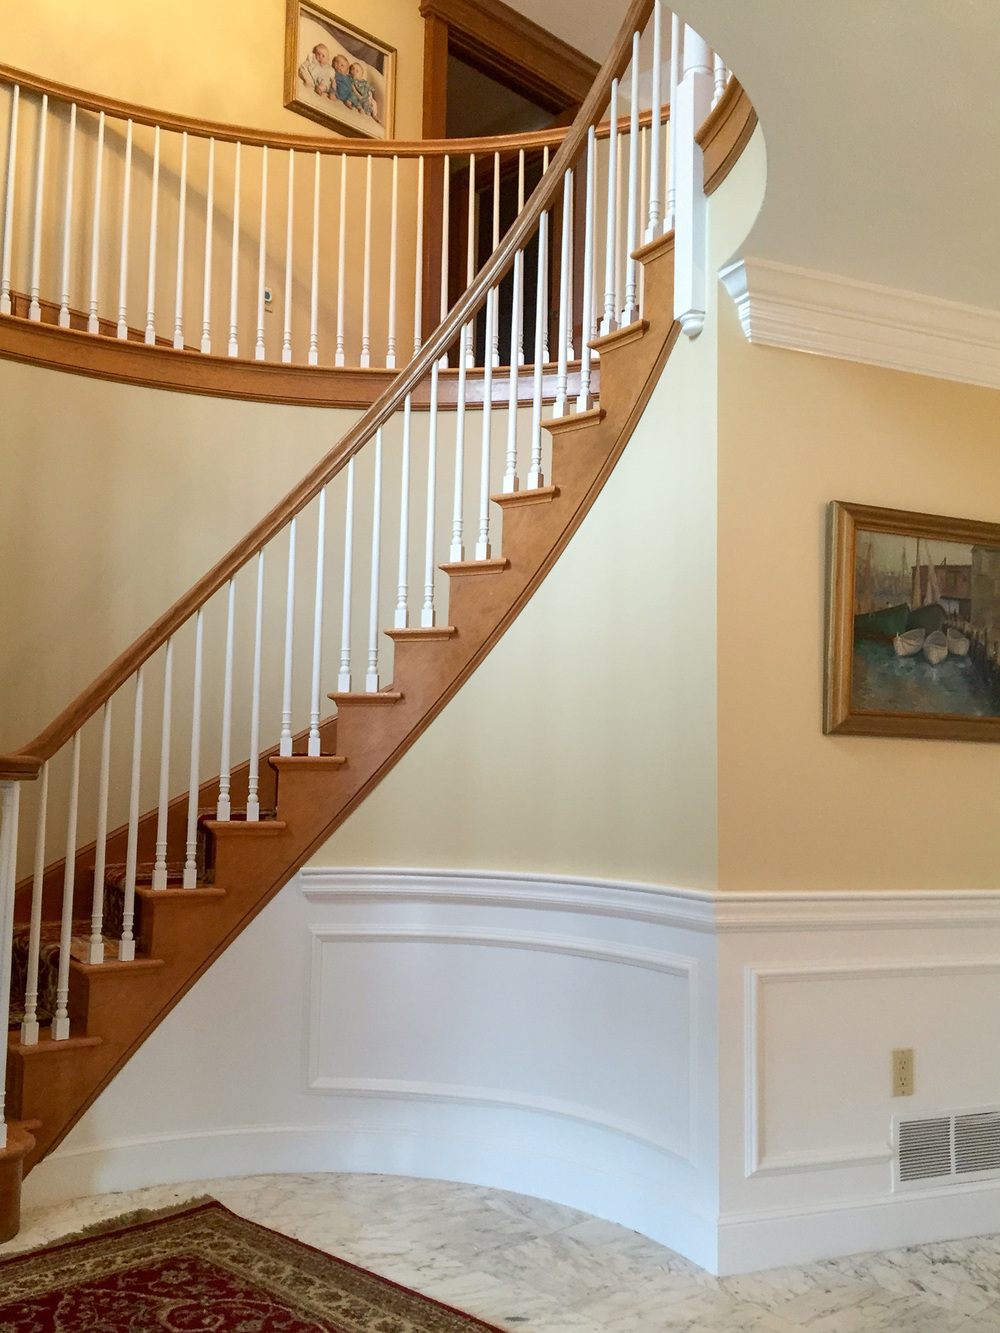 big-dog-painting-stairs-and-railing.jpg